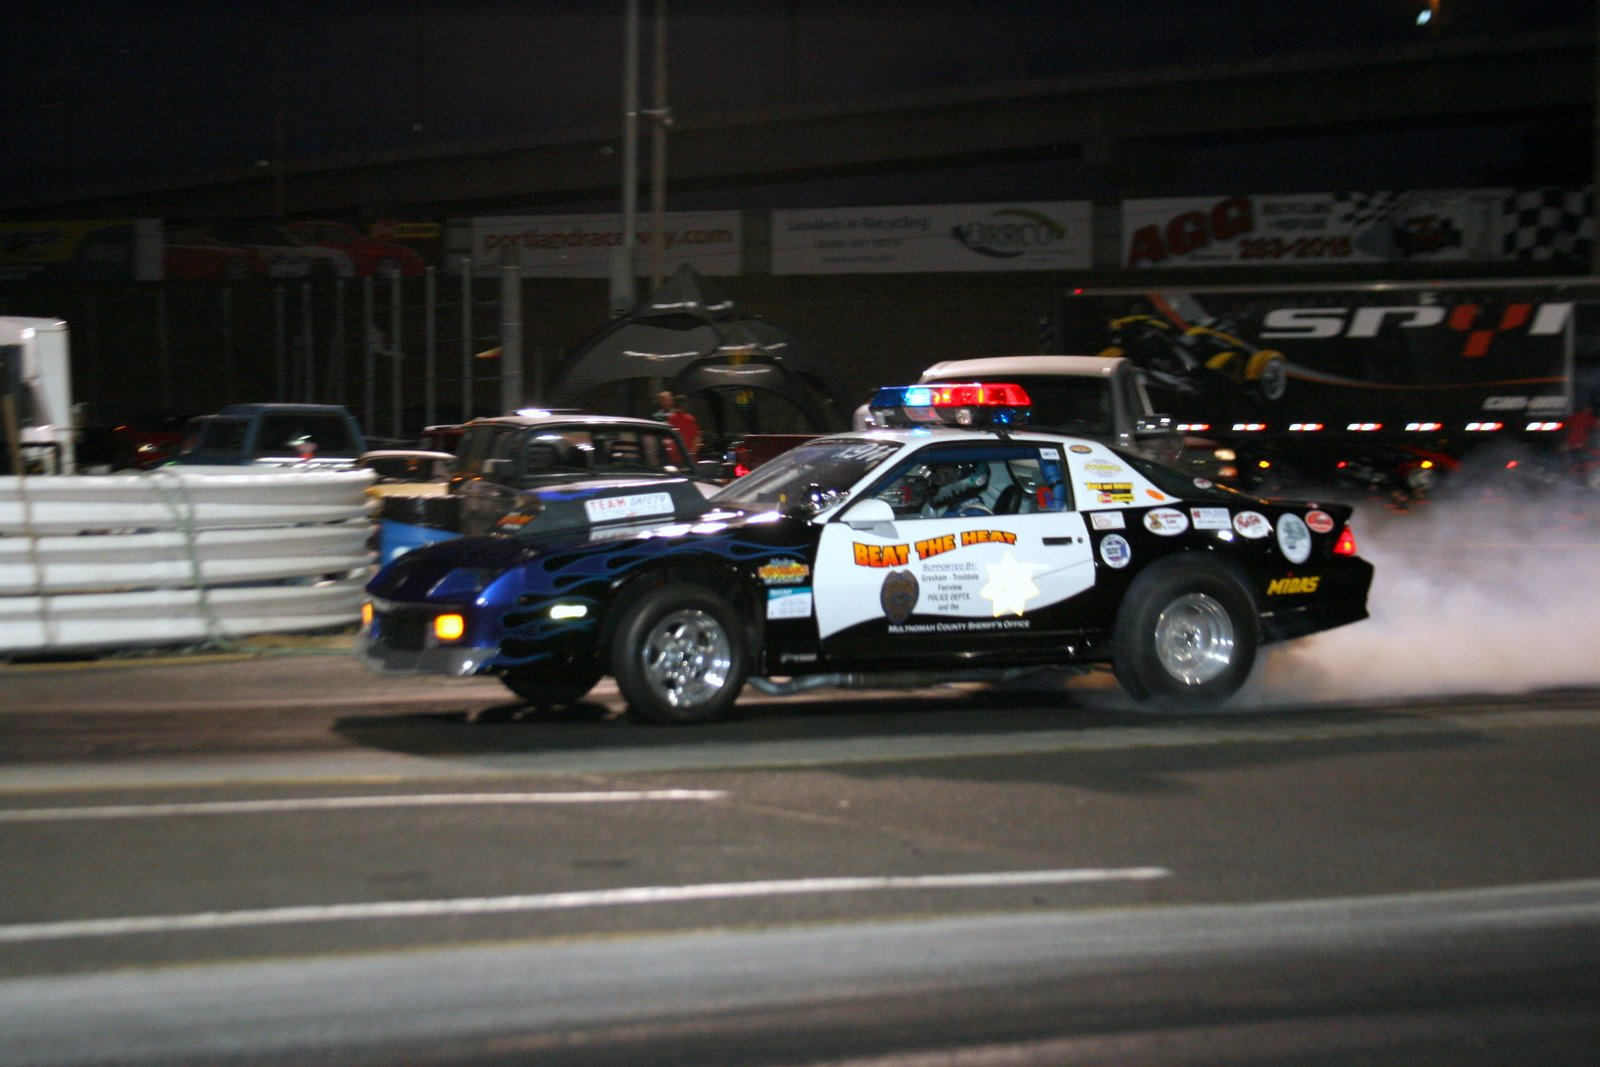 Portland International Raceway Fan Photos Beat 2009 View